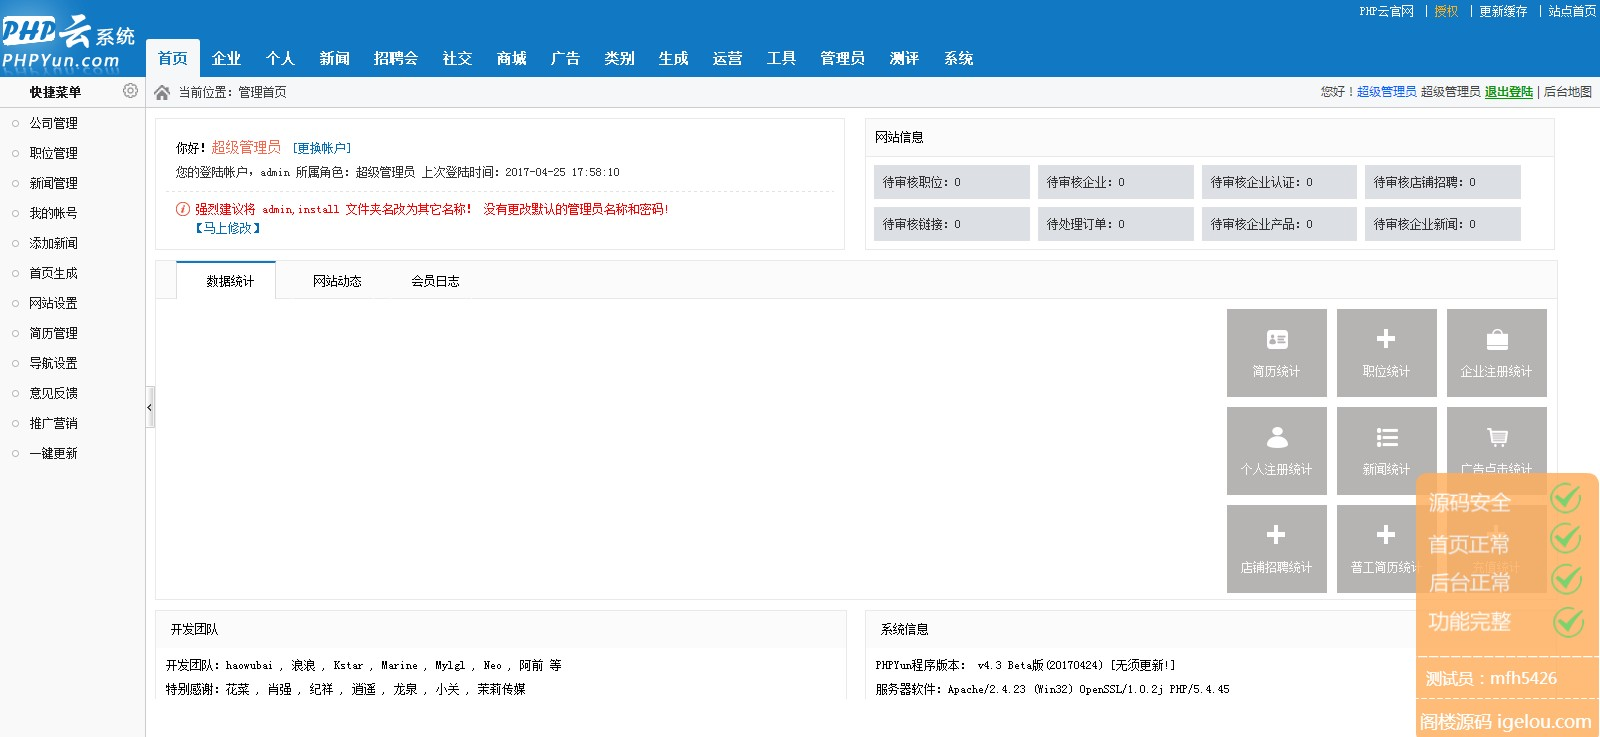 PHP云人才系统(phpyun) v4.3